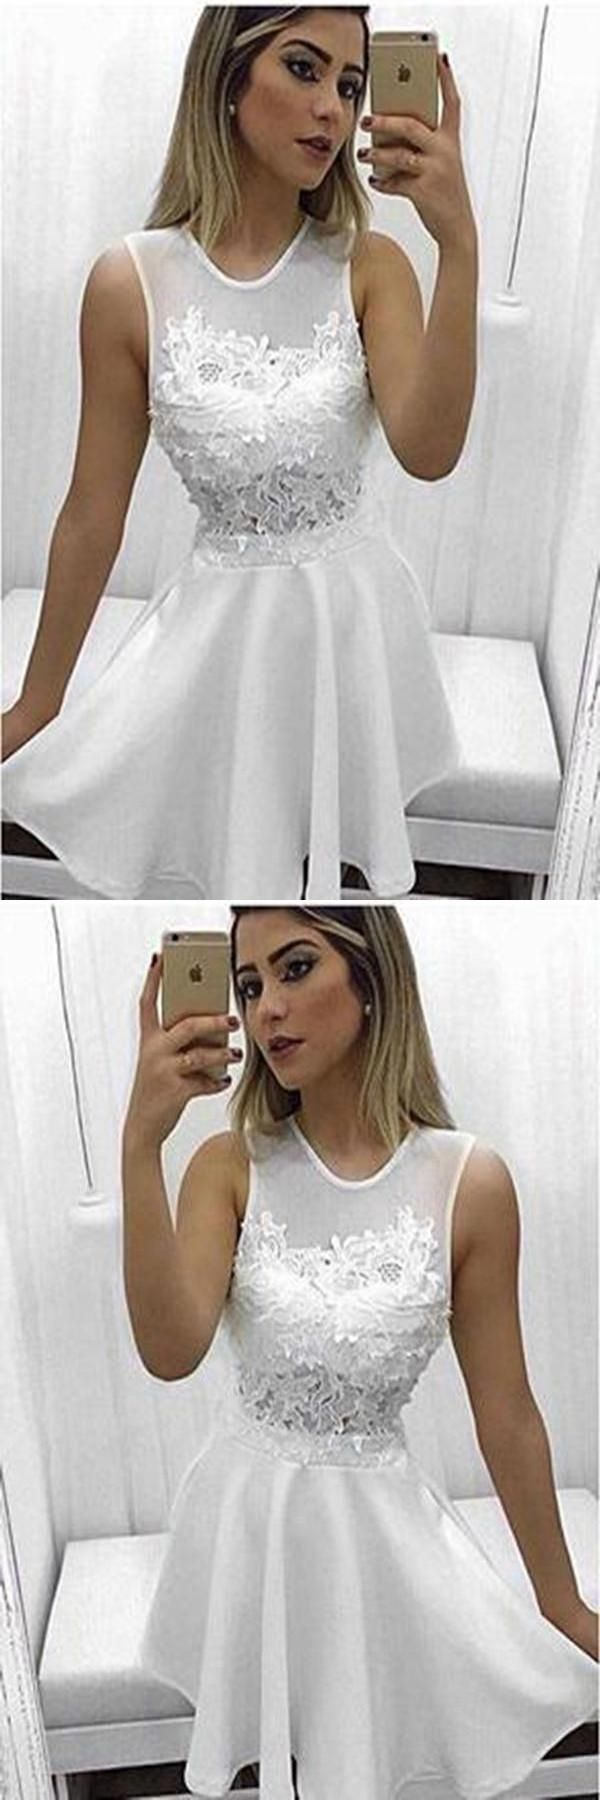 Distinct short prom dresses chic white satin scoop appliques short